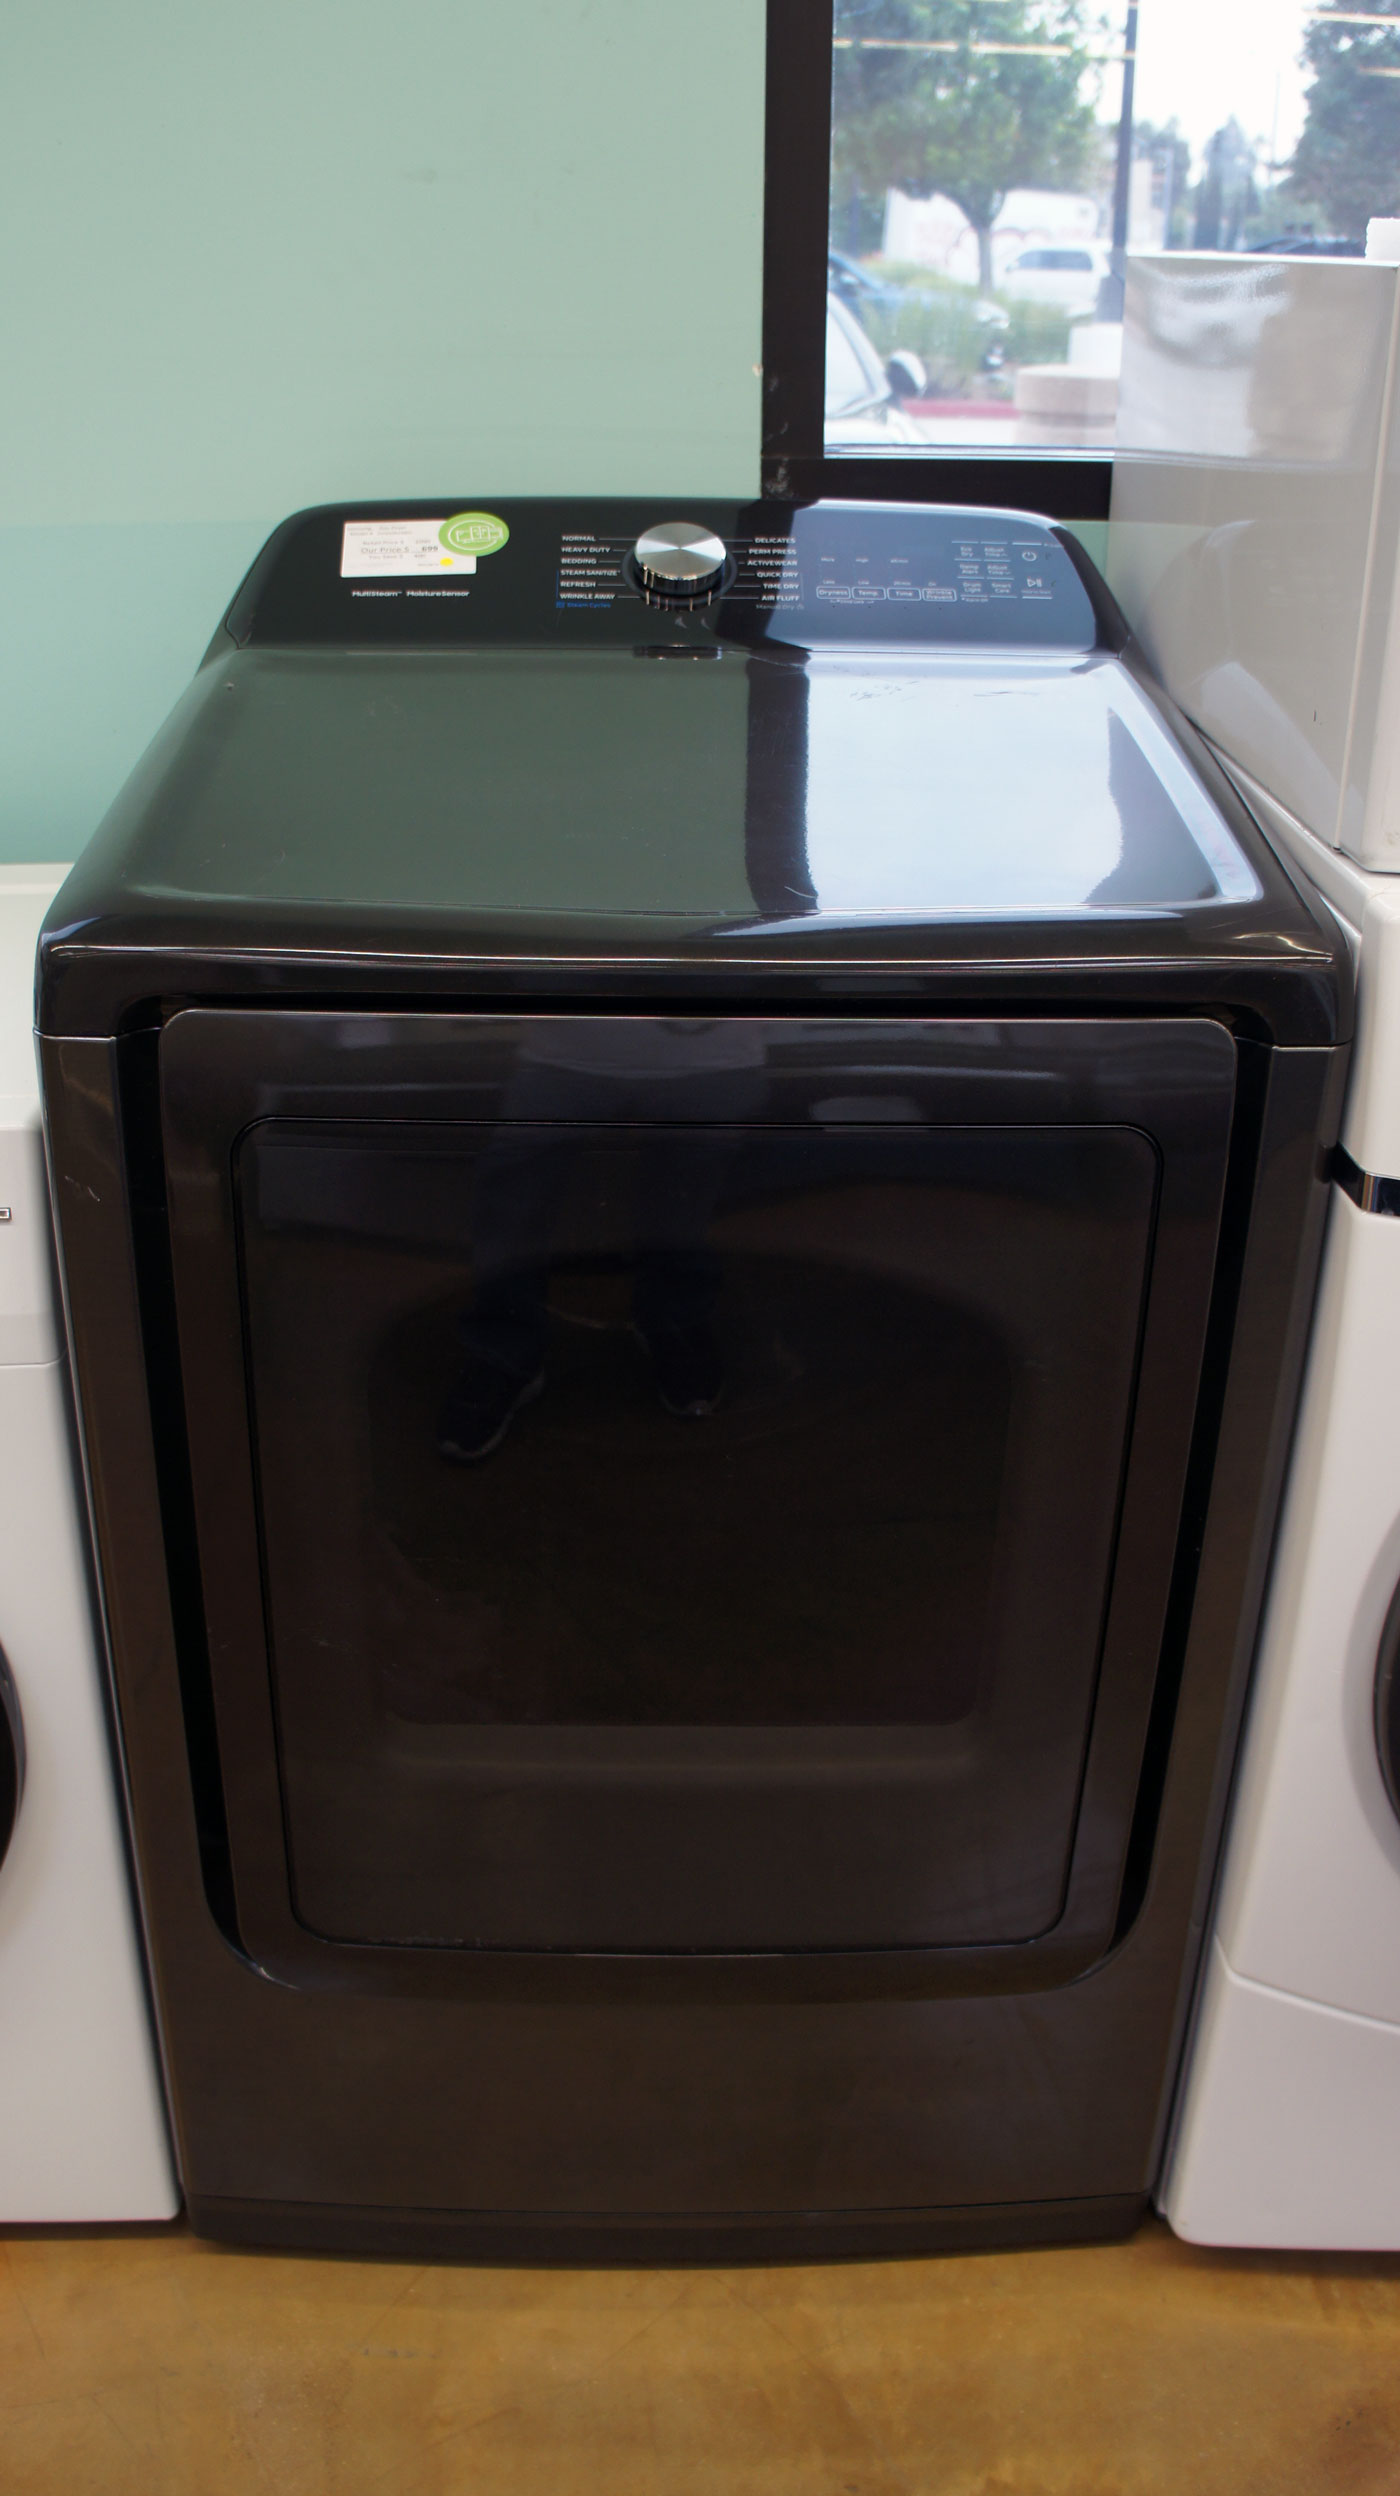 "27"" Samsung DVG50R5400V 7.4 cu.ft. Capacity Gas Dryer"